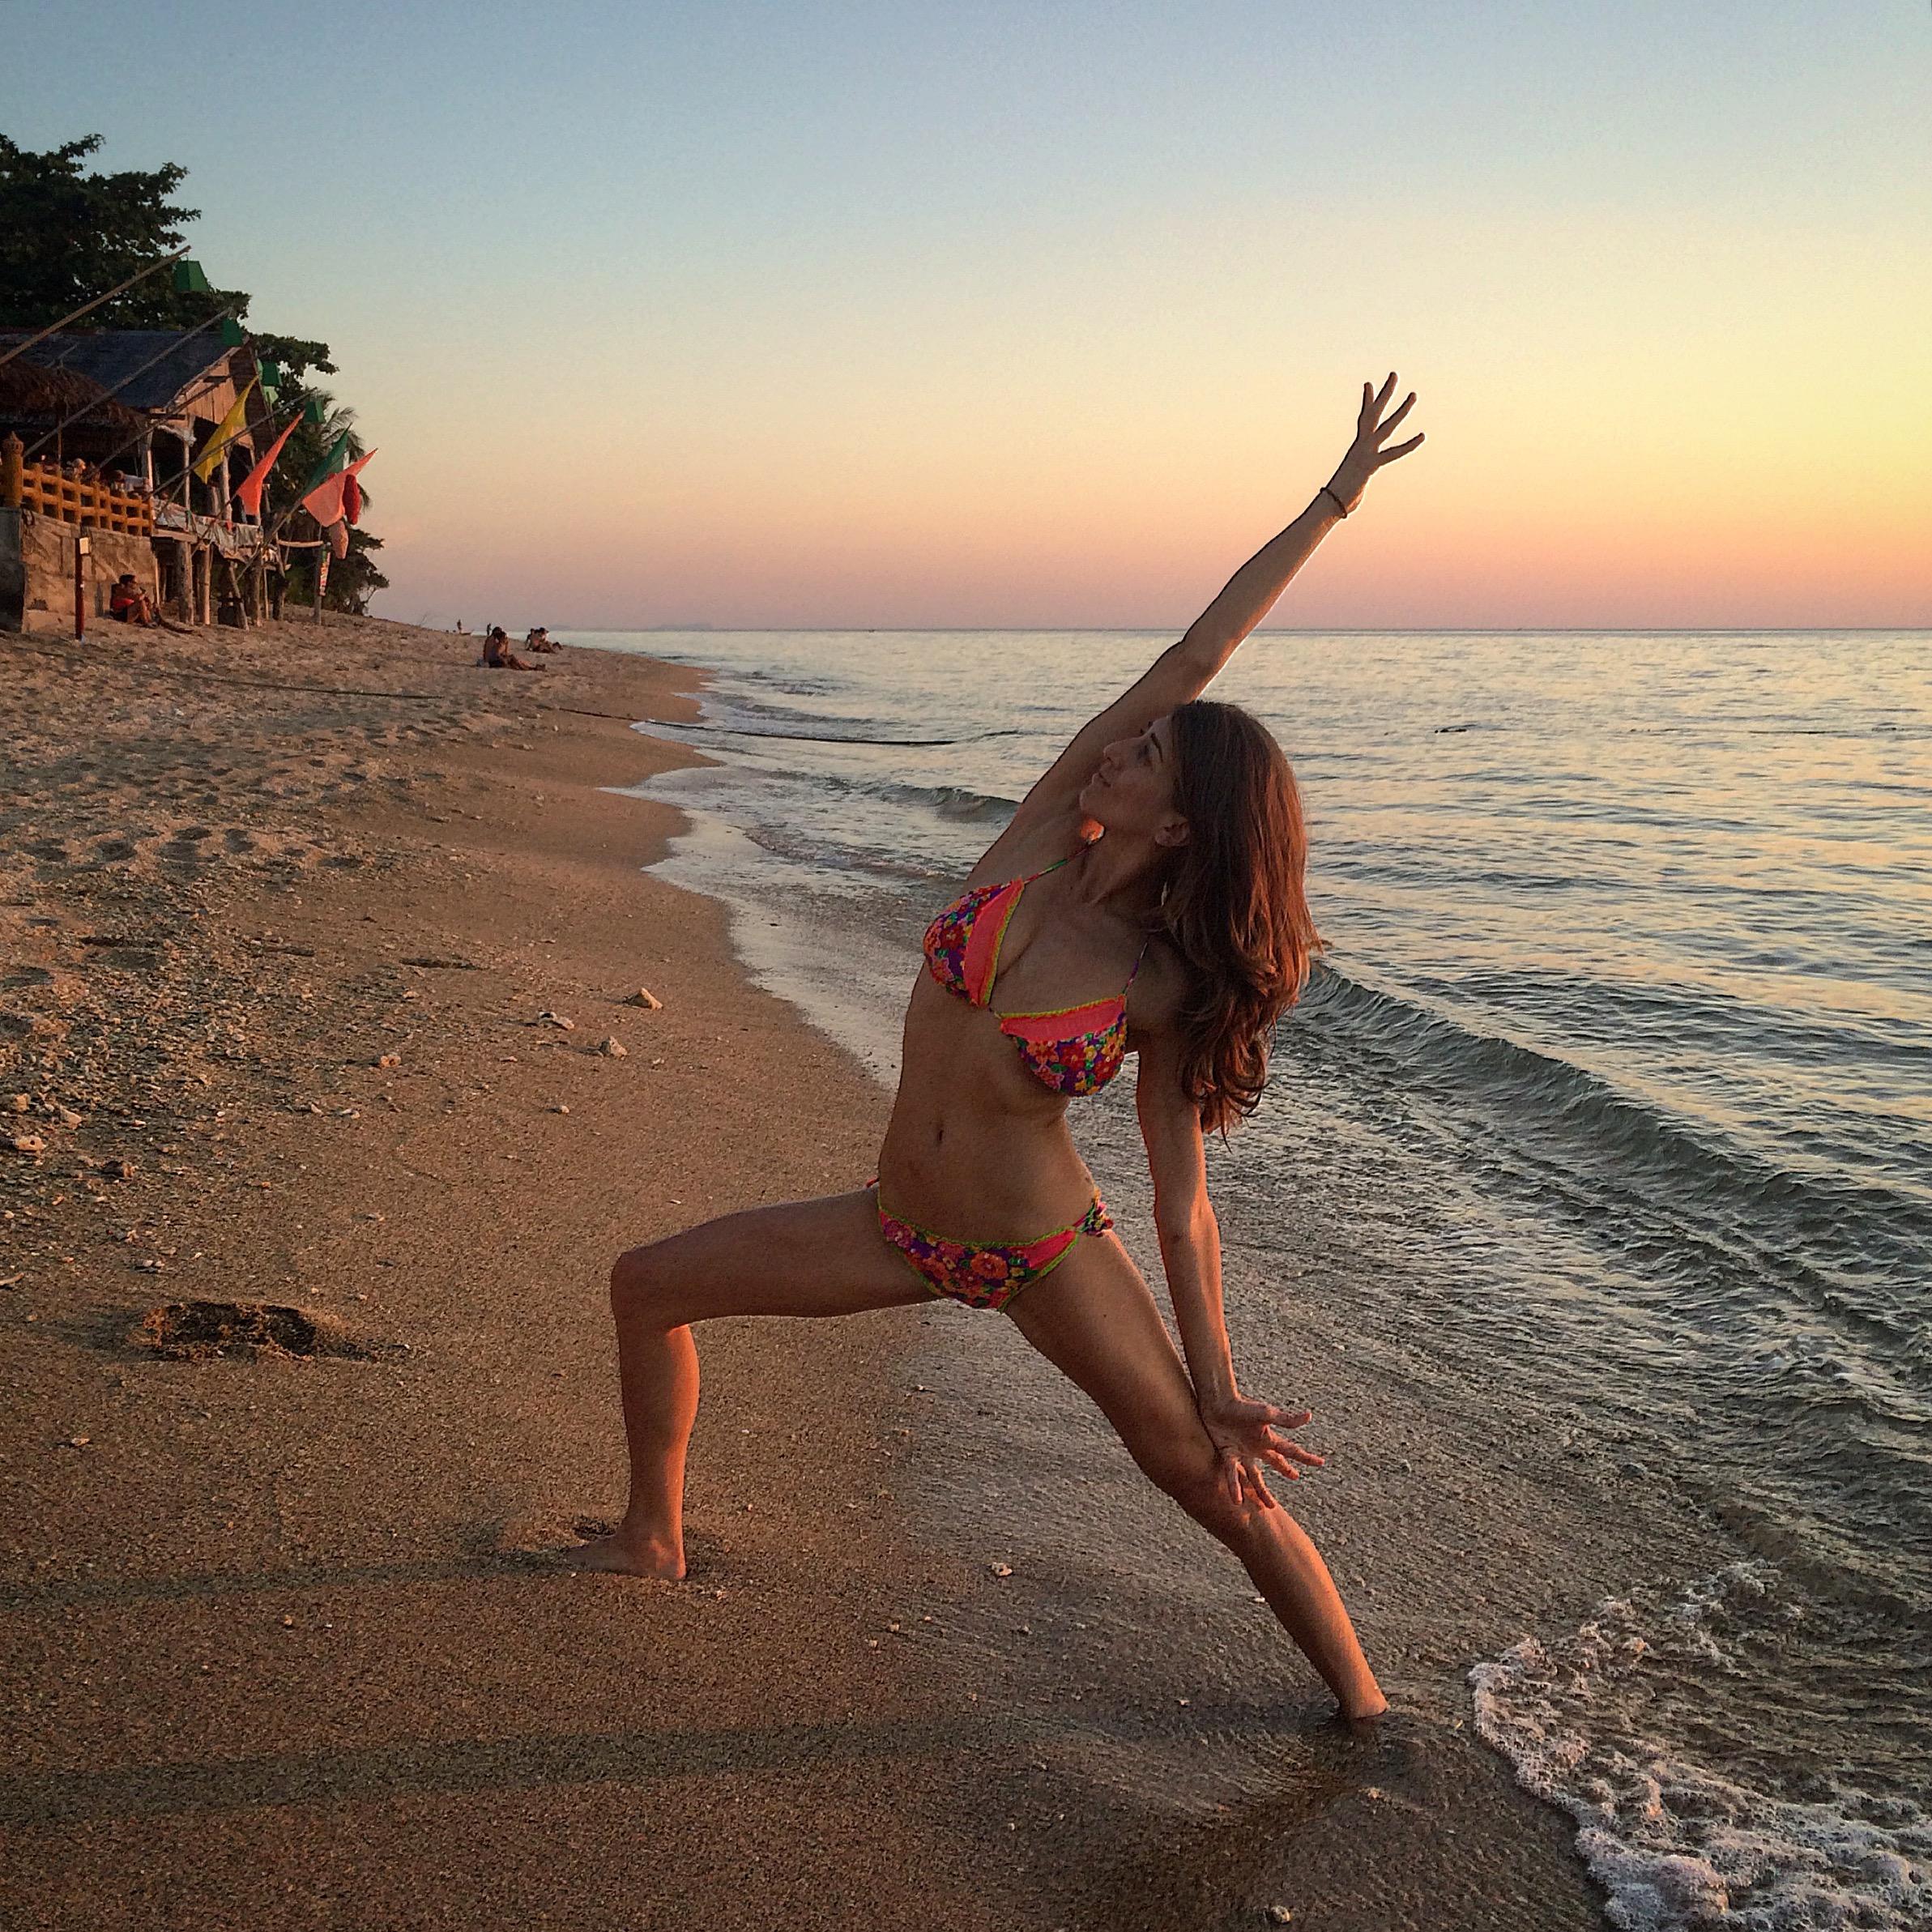 Yogi: @rima_danielle, Bikini: @floriditaswimwear in Koh Lanta, Thailand.